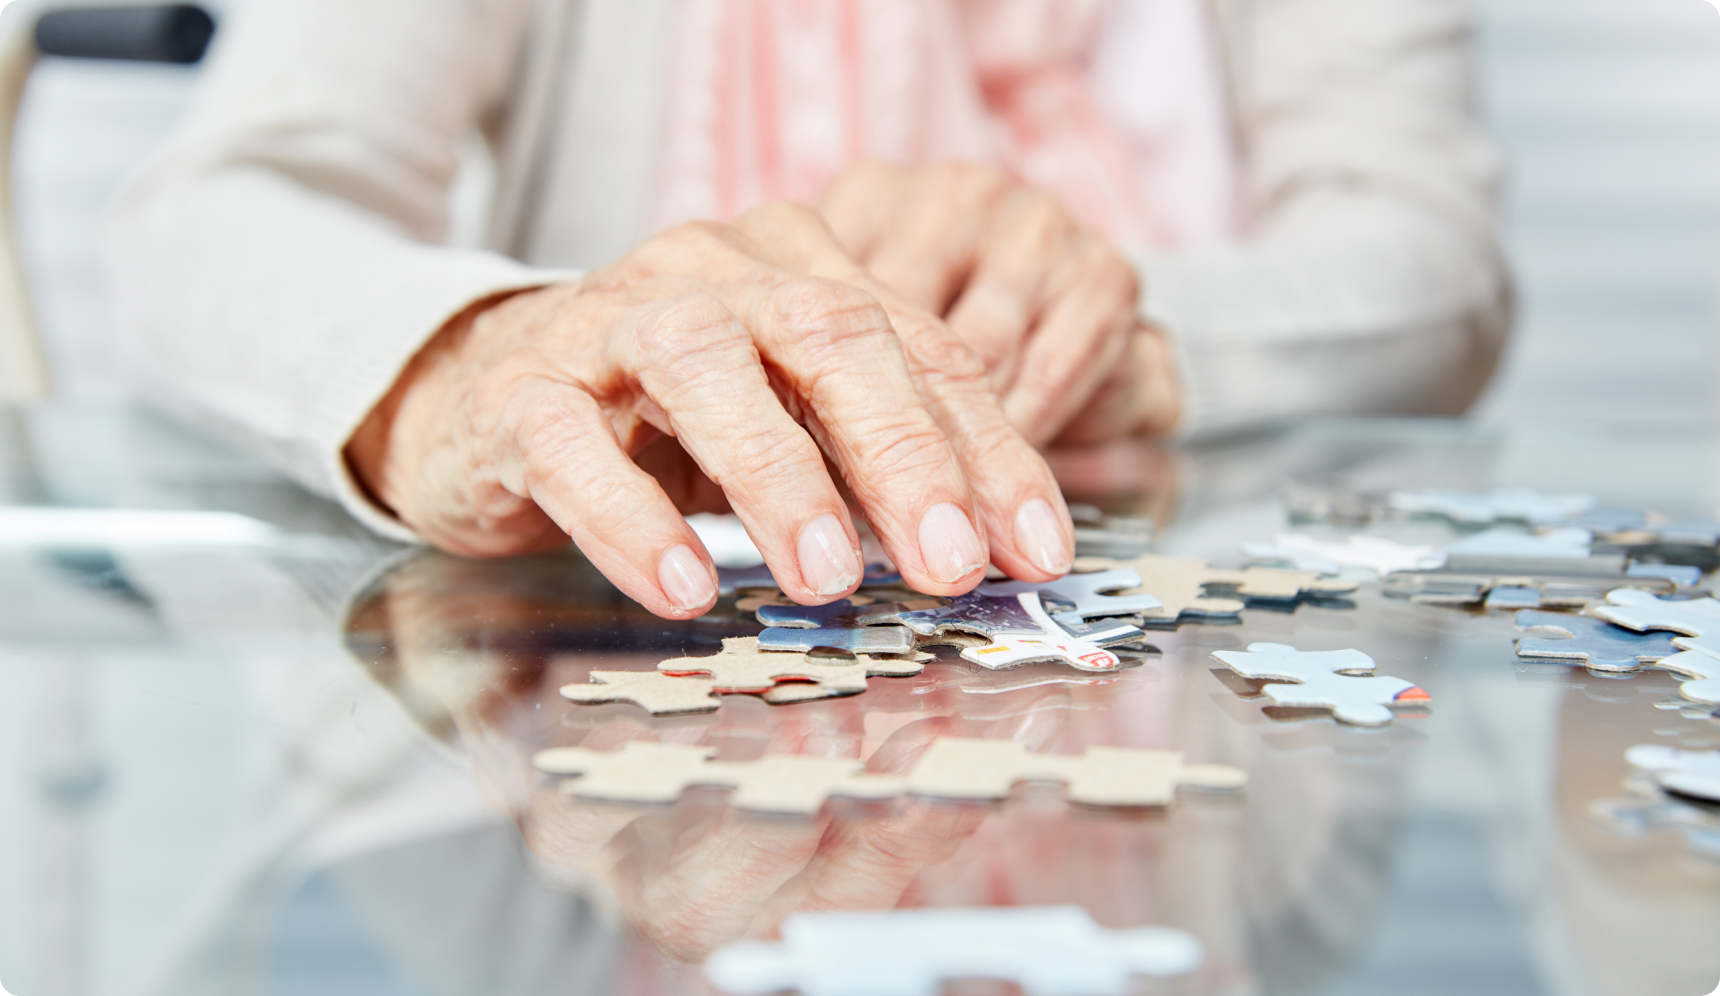 Elderly hands over puzzle pieces